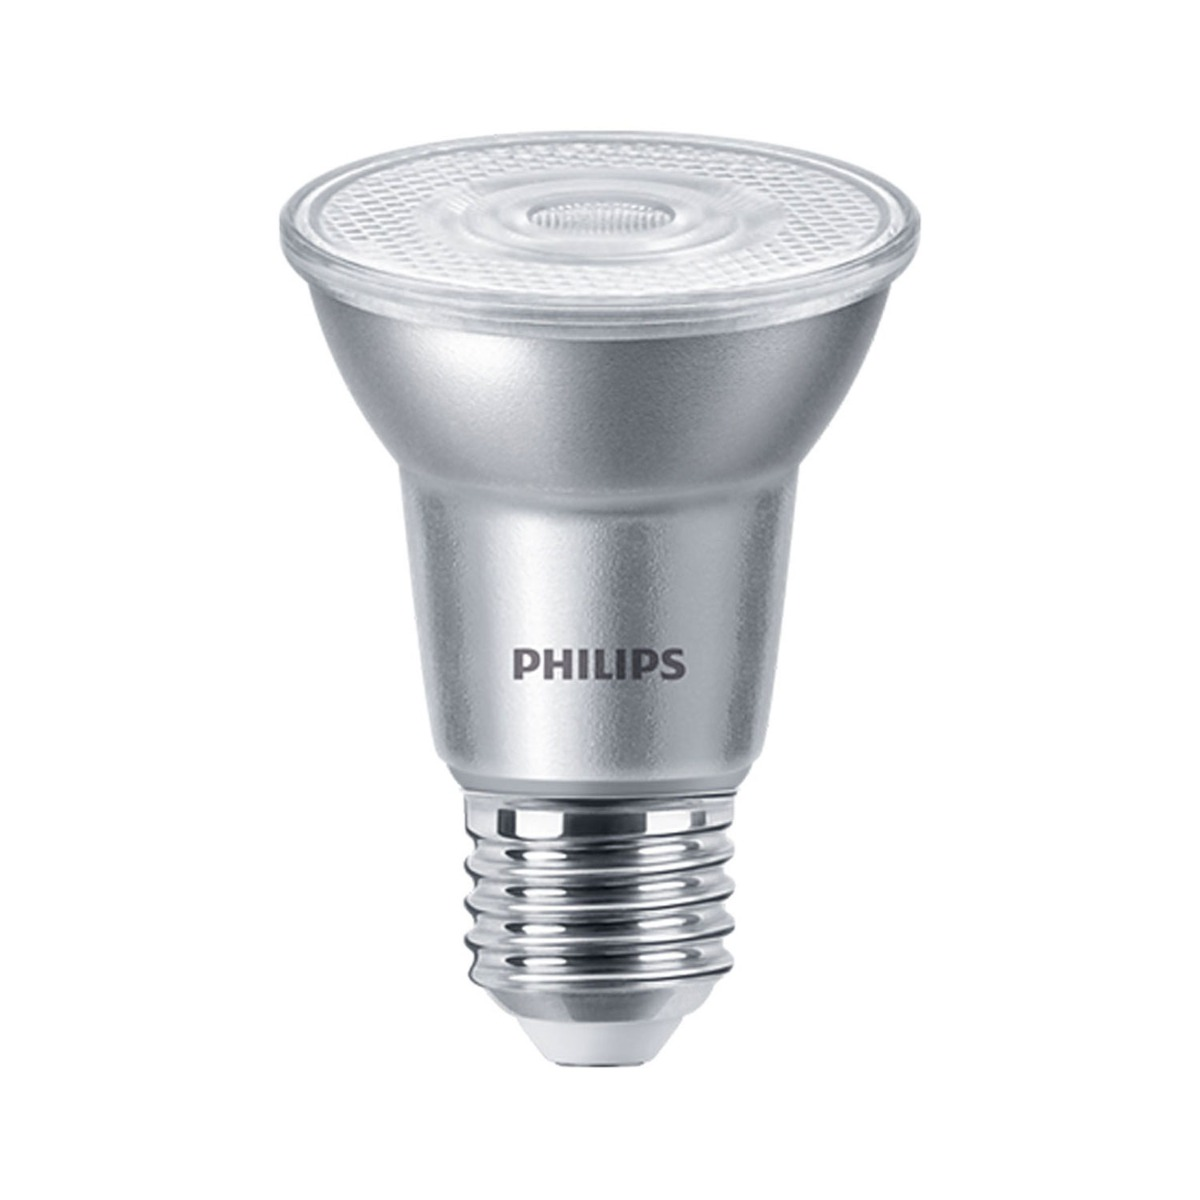 Philips LEDspot E27 PAR20 6W 830 25D 515lm (MASTER) | Dimbaar - Warm Wit - Vervangt 50W